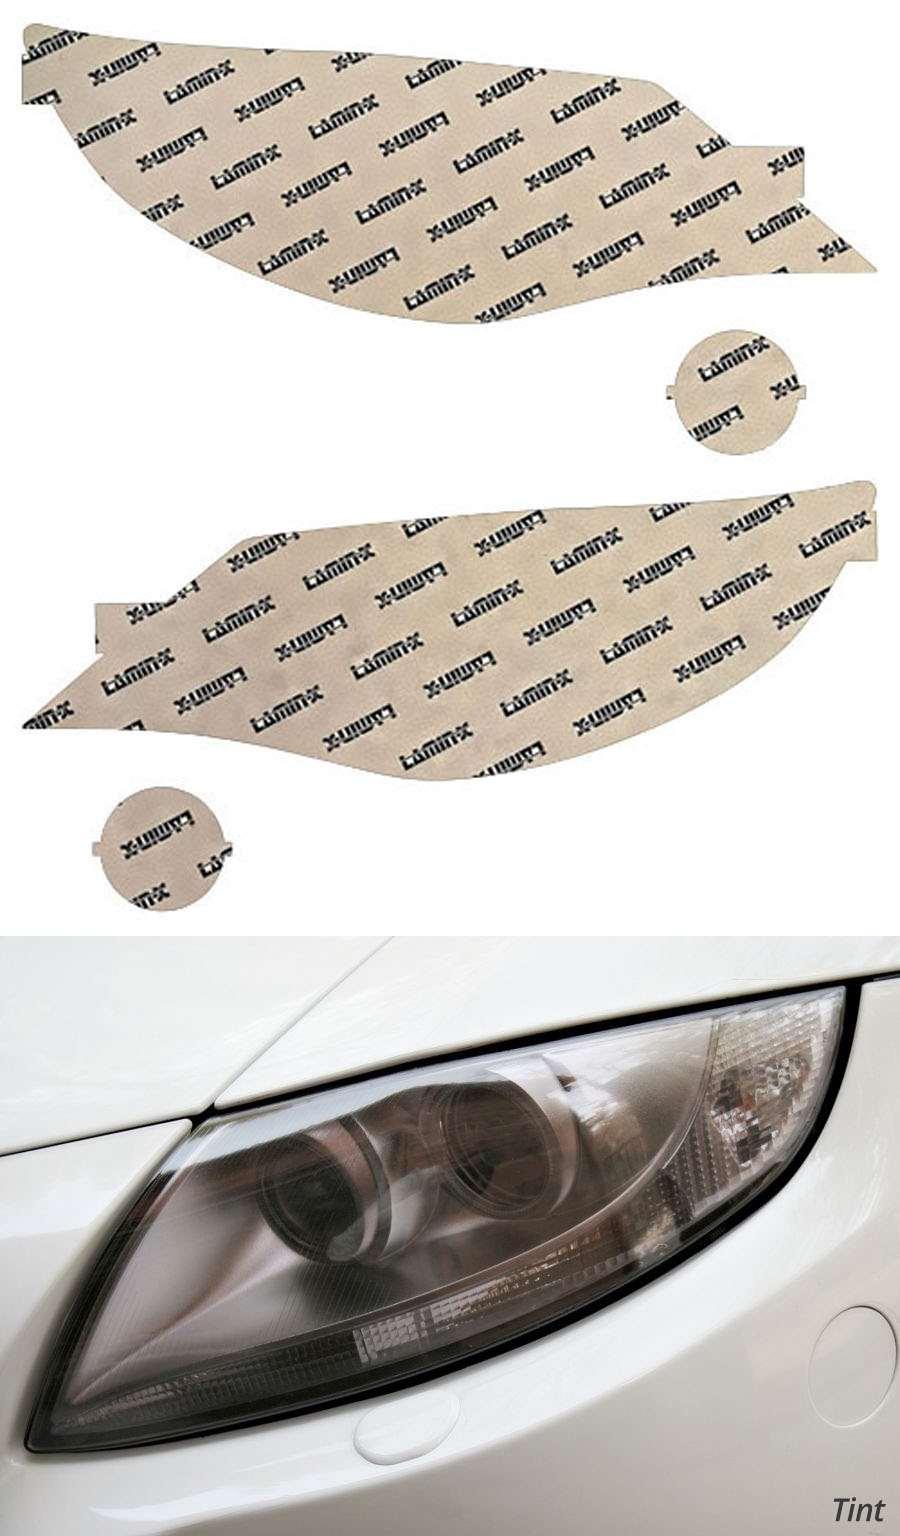 Subaru Outback Sport 08-11 Tint Headlight Covers Lamin-X S524T